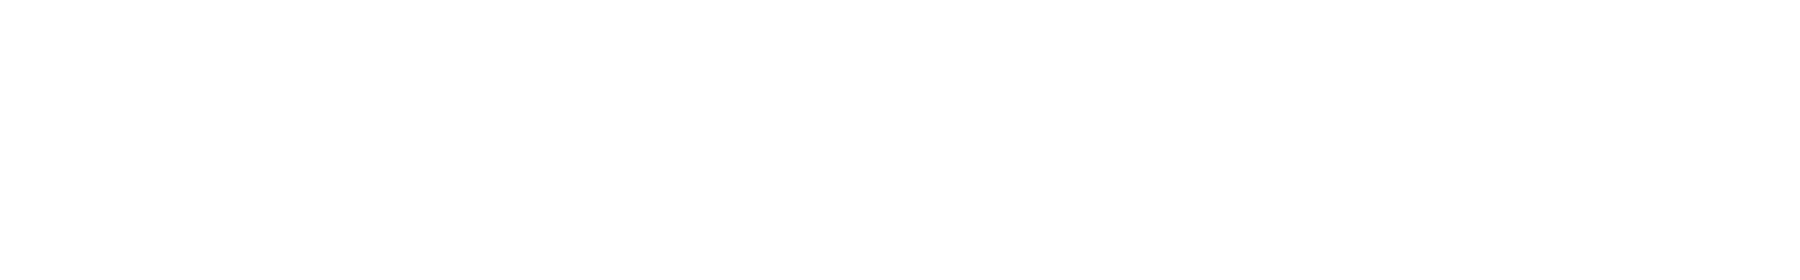 dts chordlp 51c cm dry